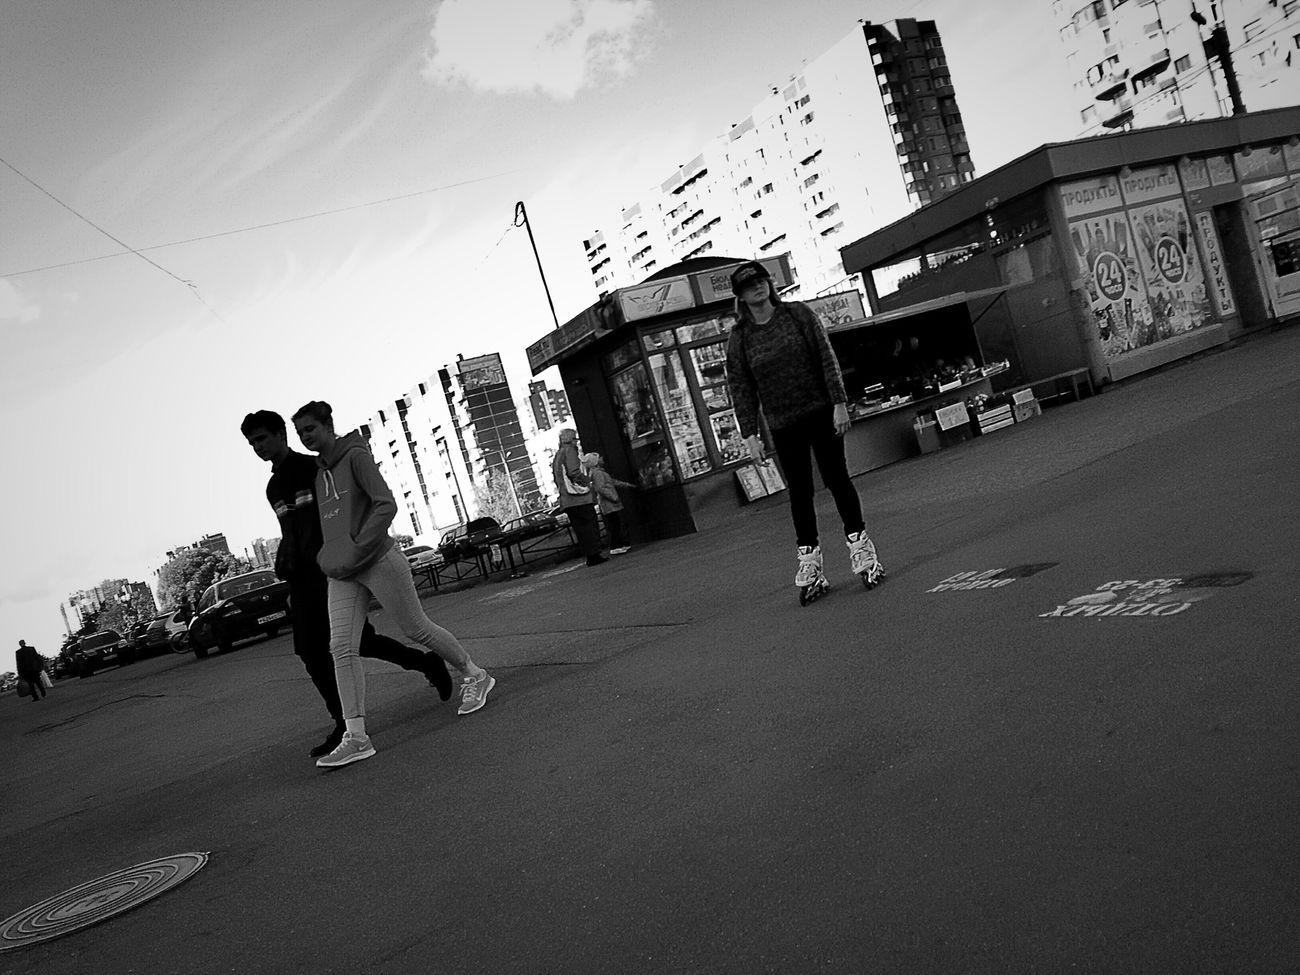 People Watching Blackandwhite Photography Streetphotography Streetphoto_bw Black & White Black And White People Girl